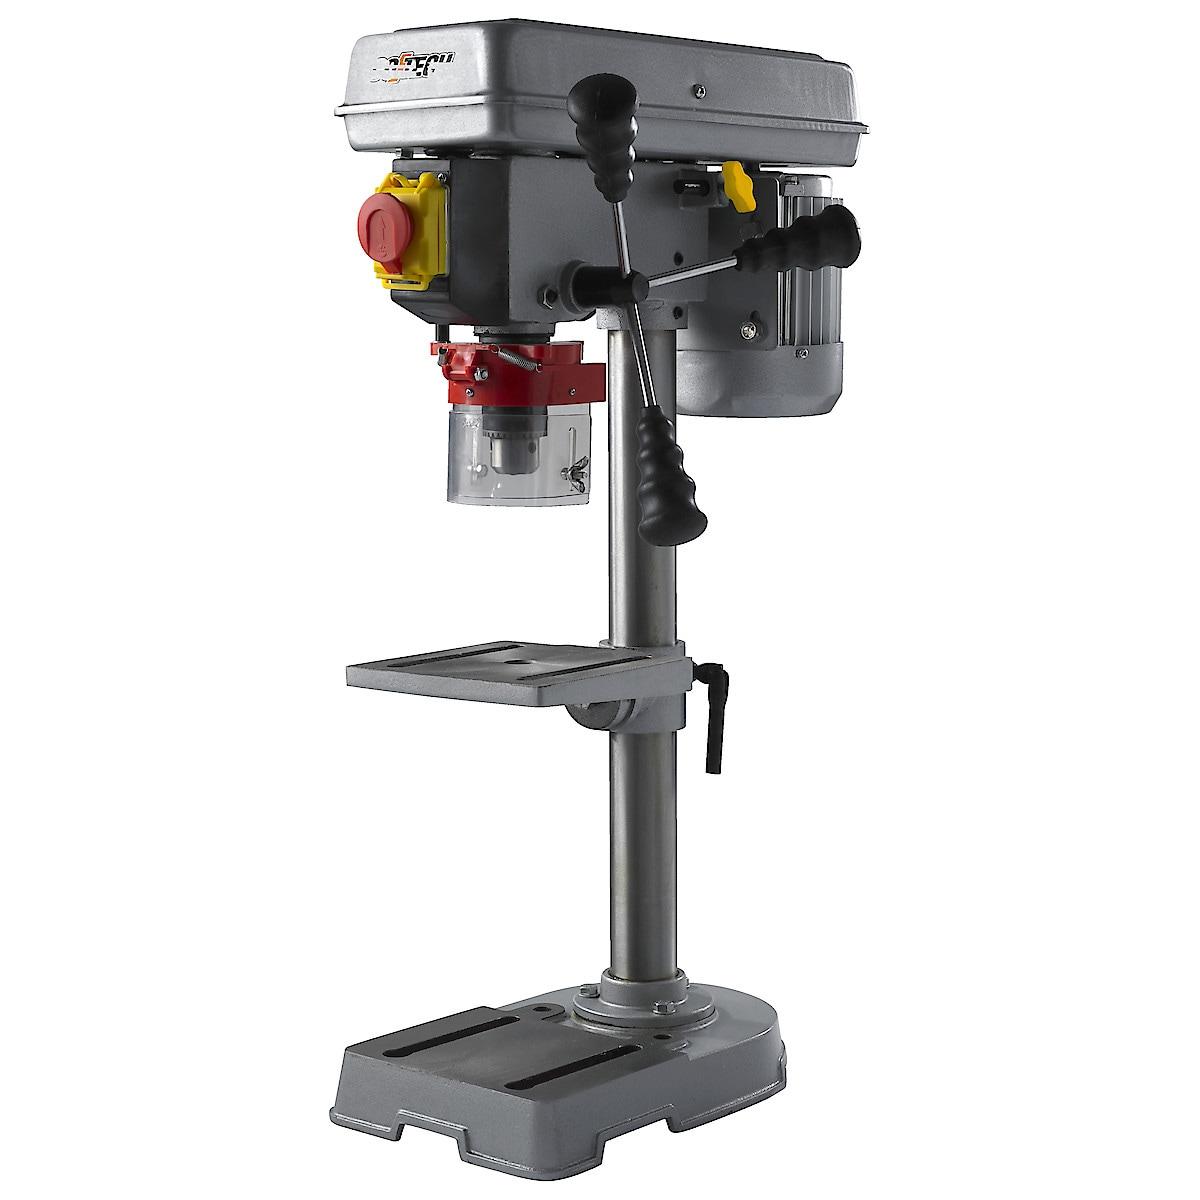 Cotech Drill Press